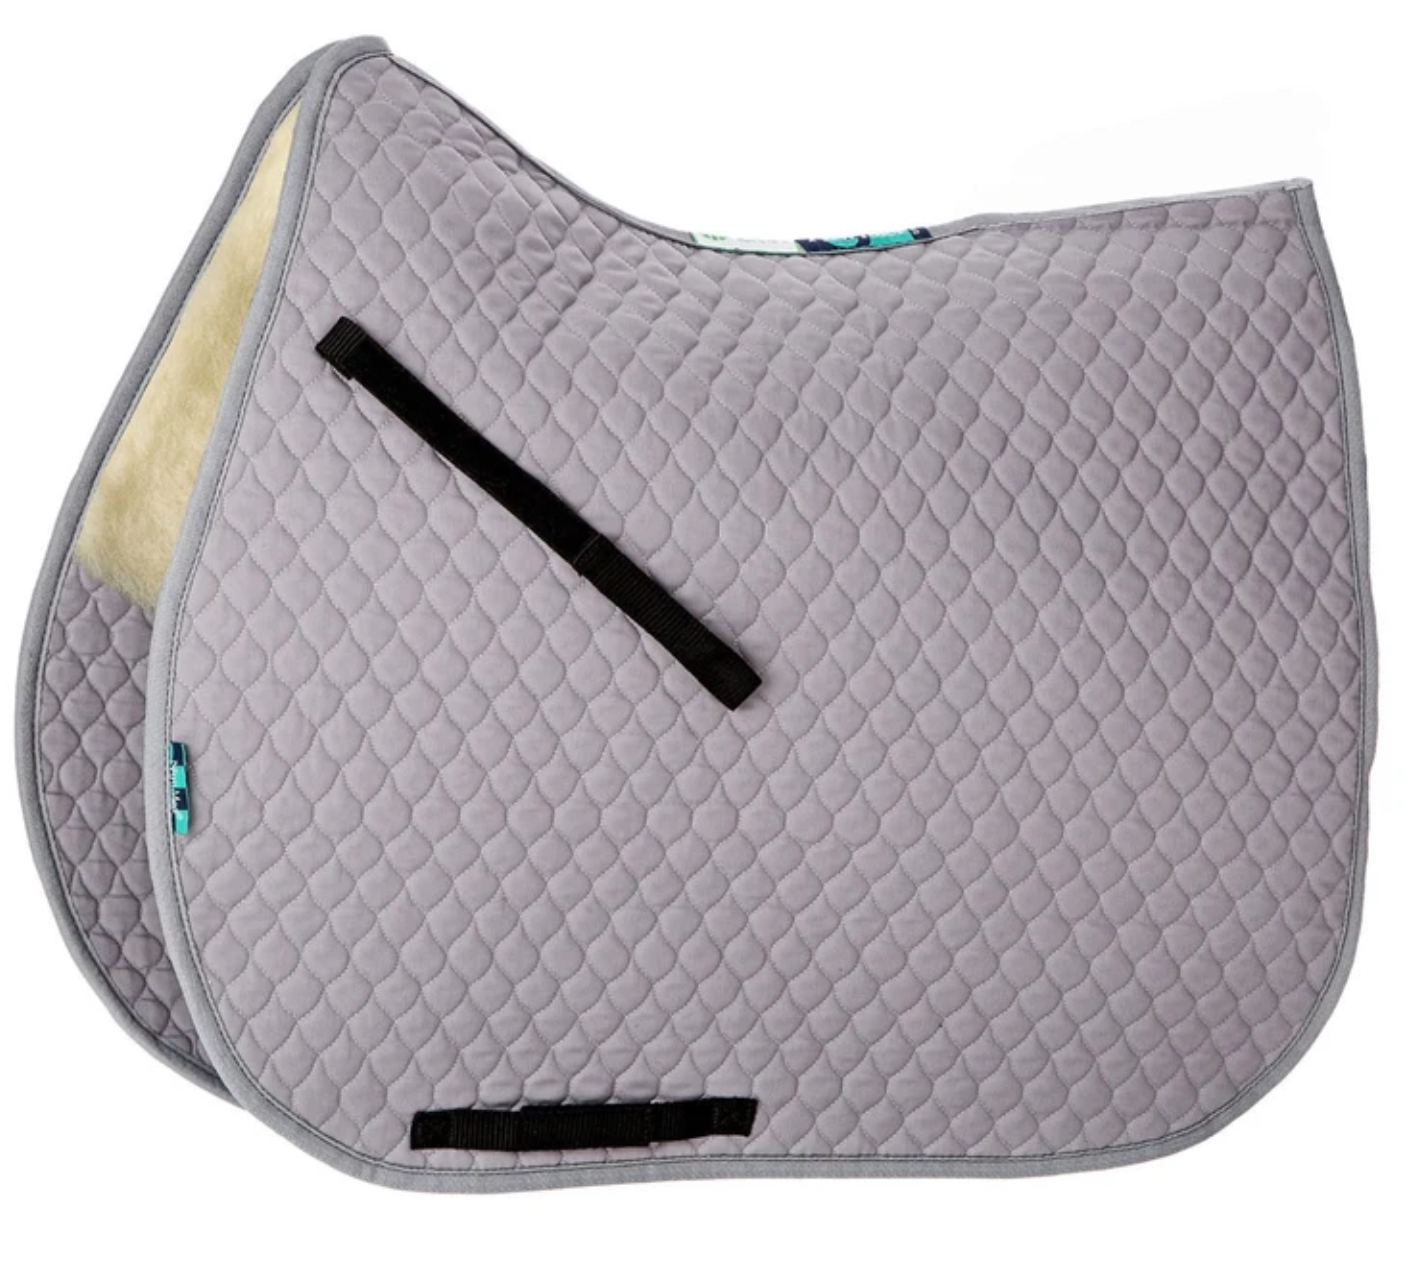 Nuumed GP HiWither Half wool Saddlepad SP01 5oz